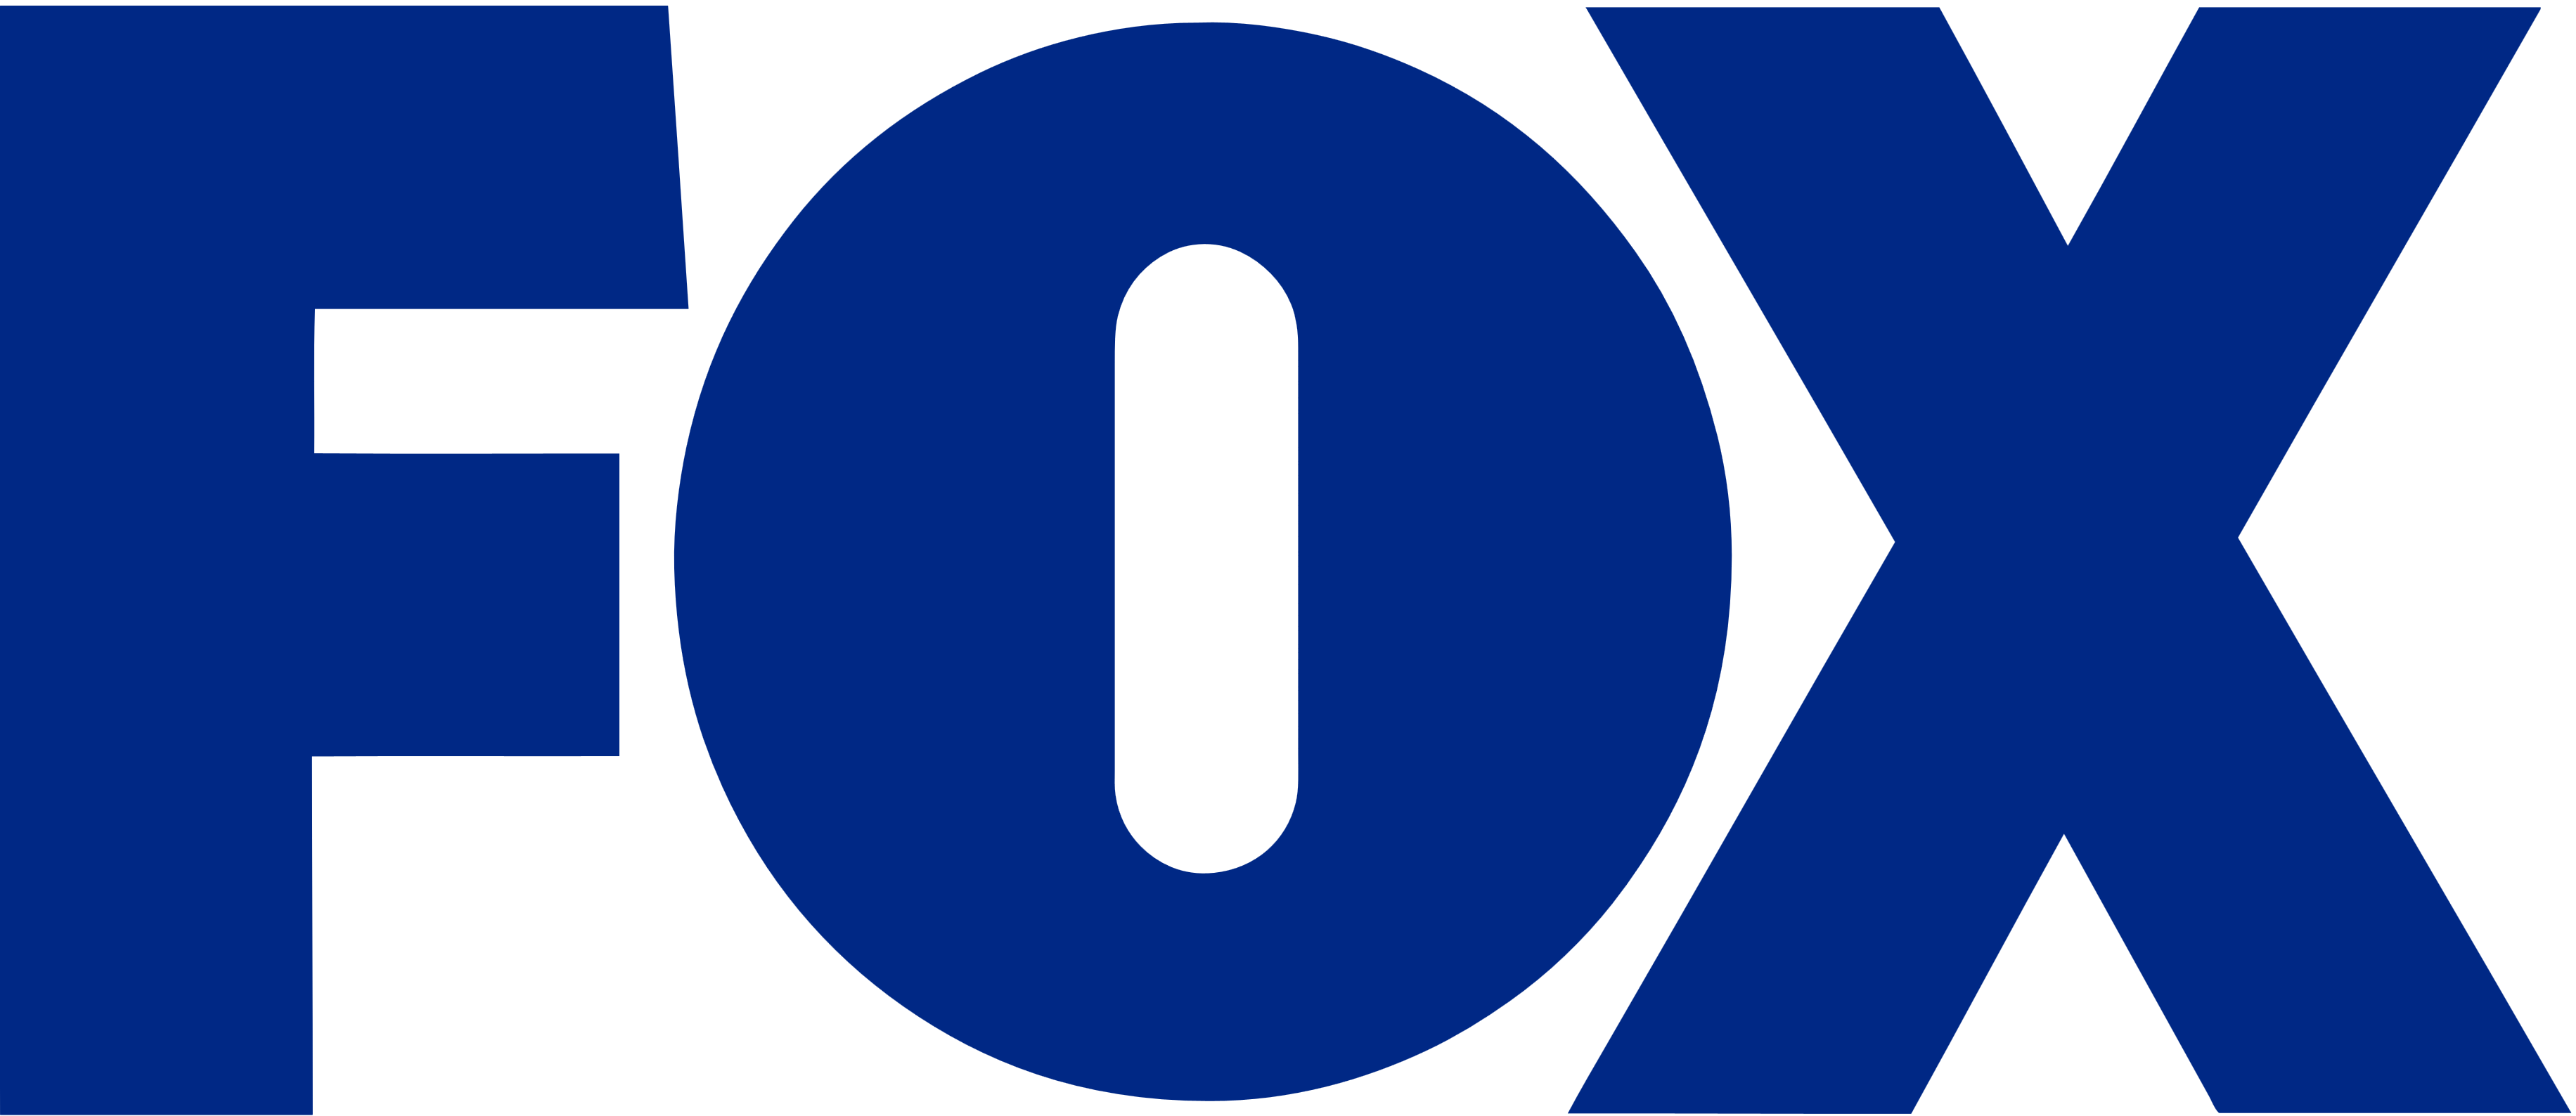 Hd fox blue logo png #1629